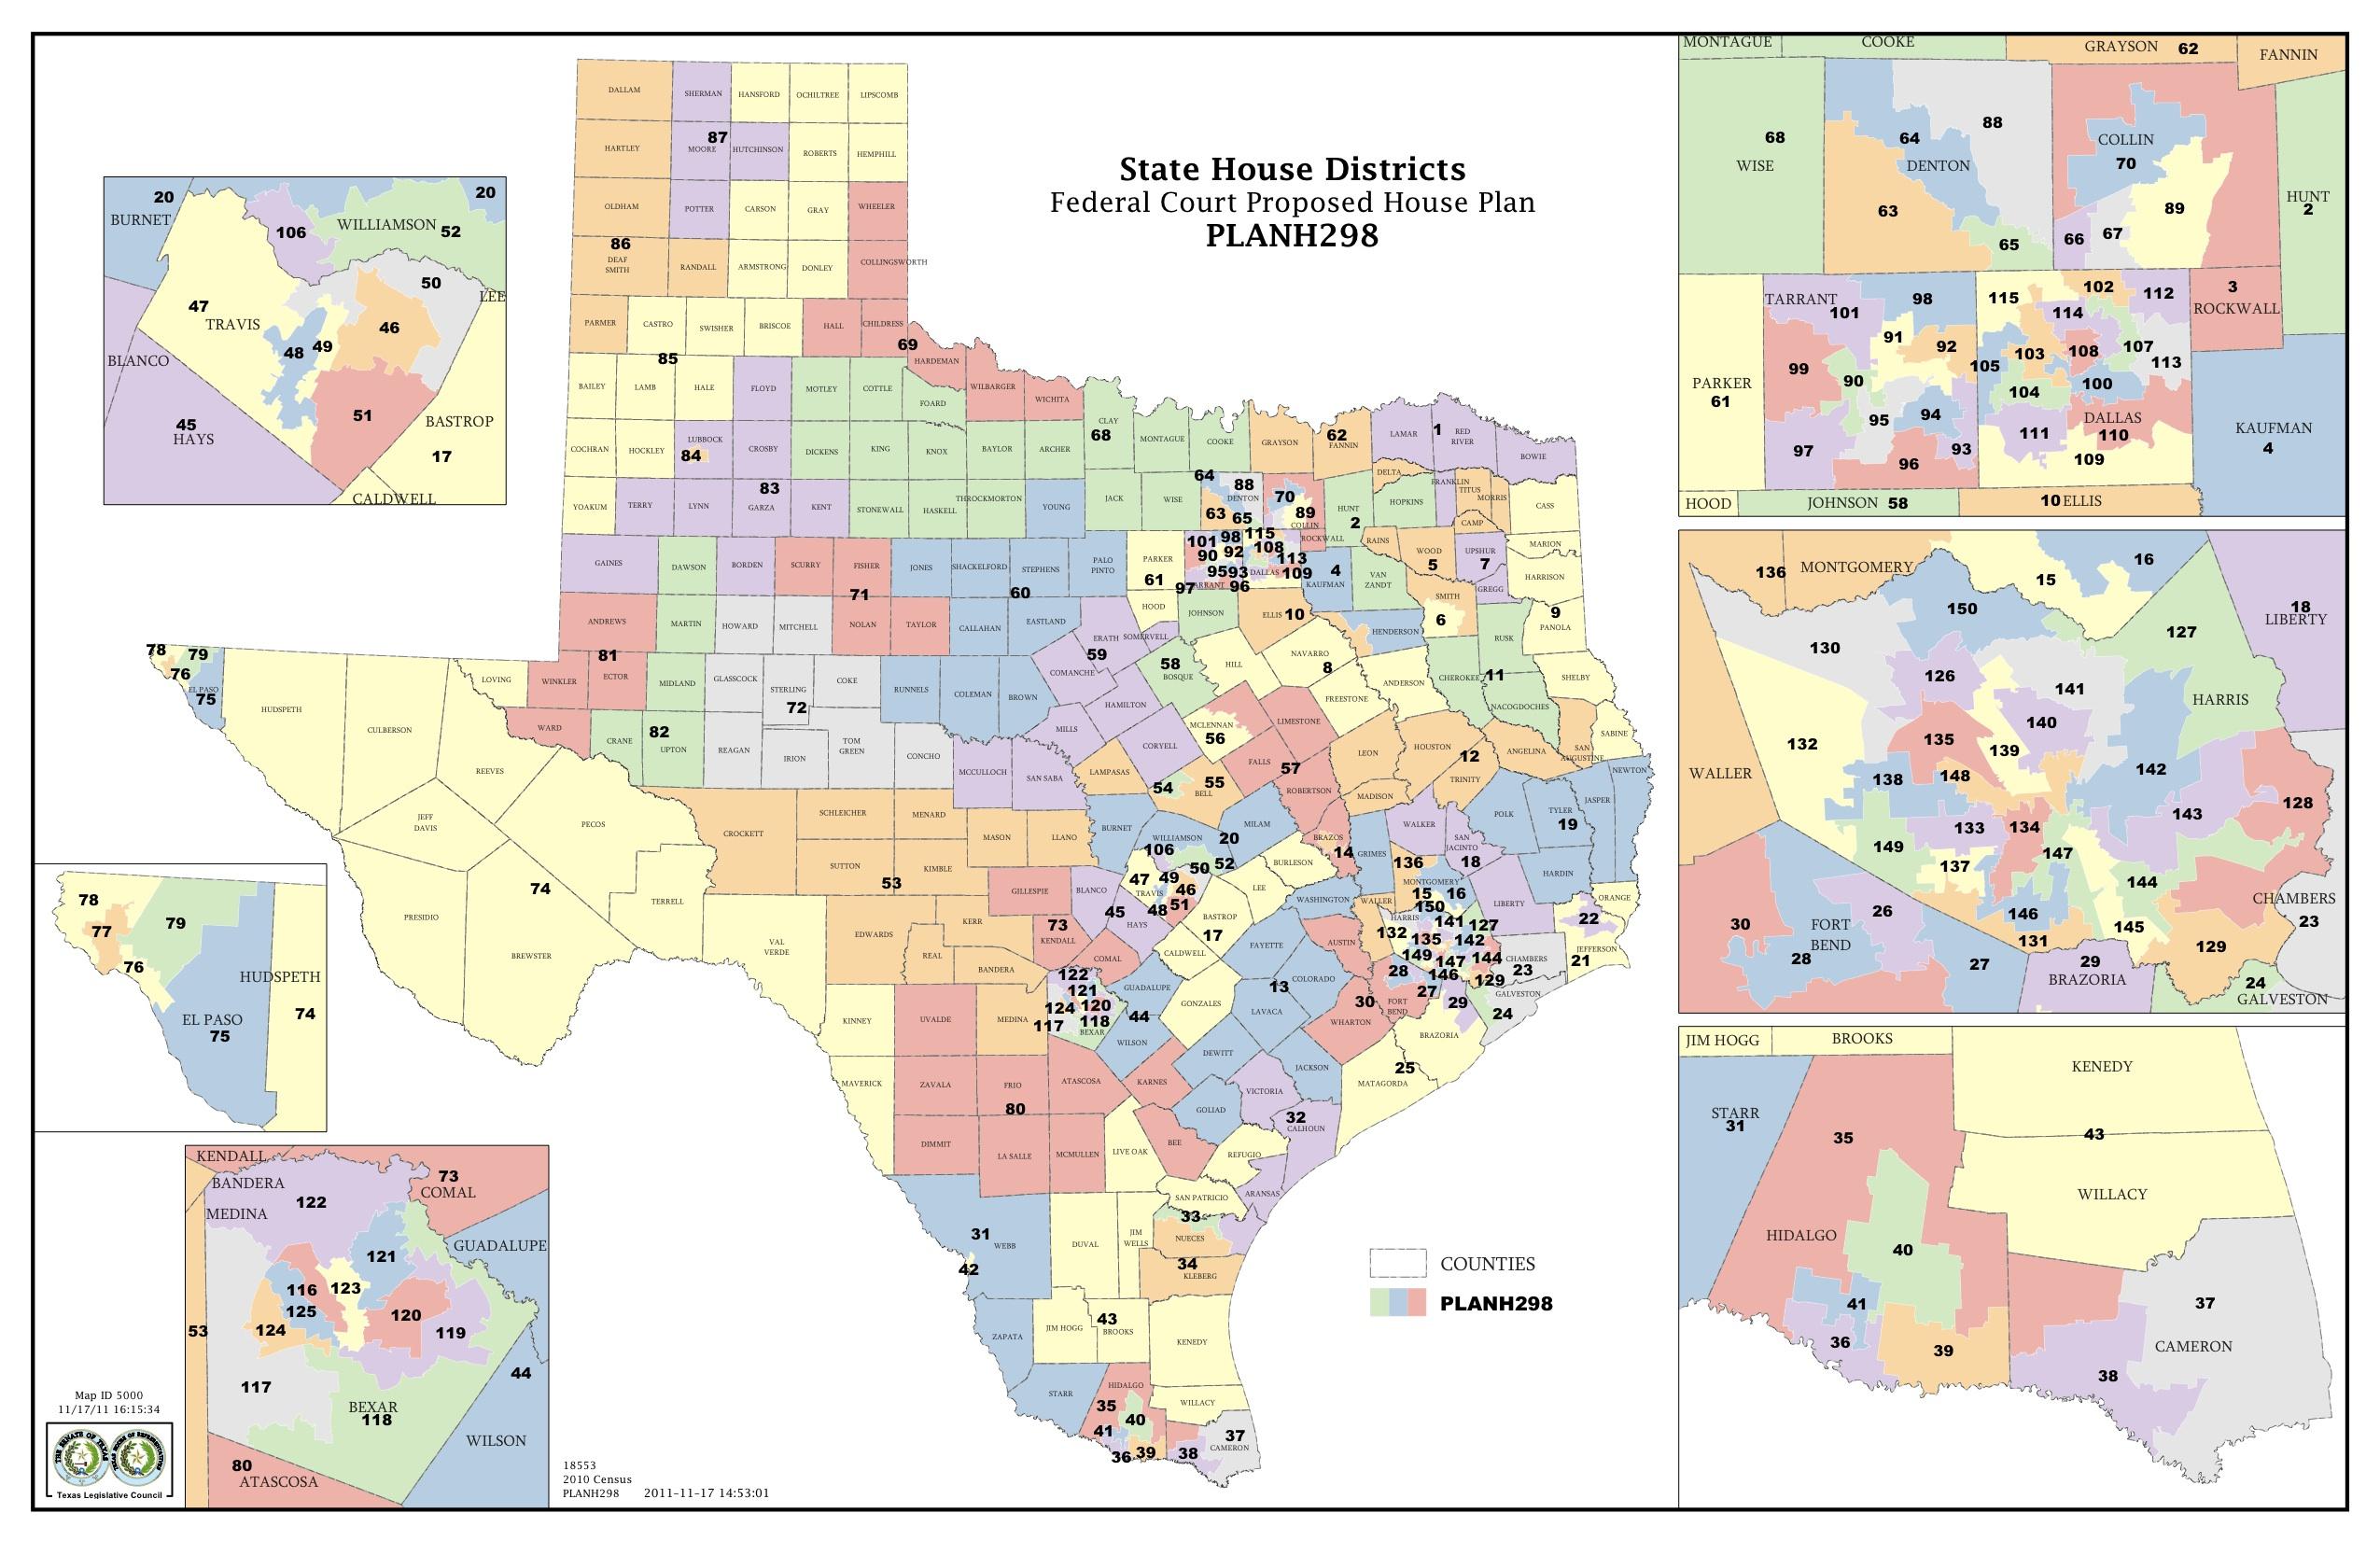 Texas State Representative District Map | Business Ideas 2013 - Texas State District Map